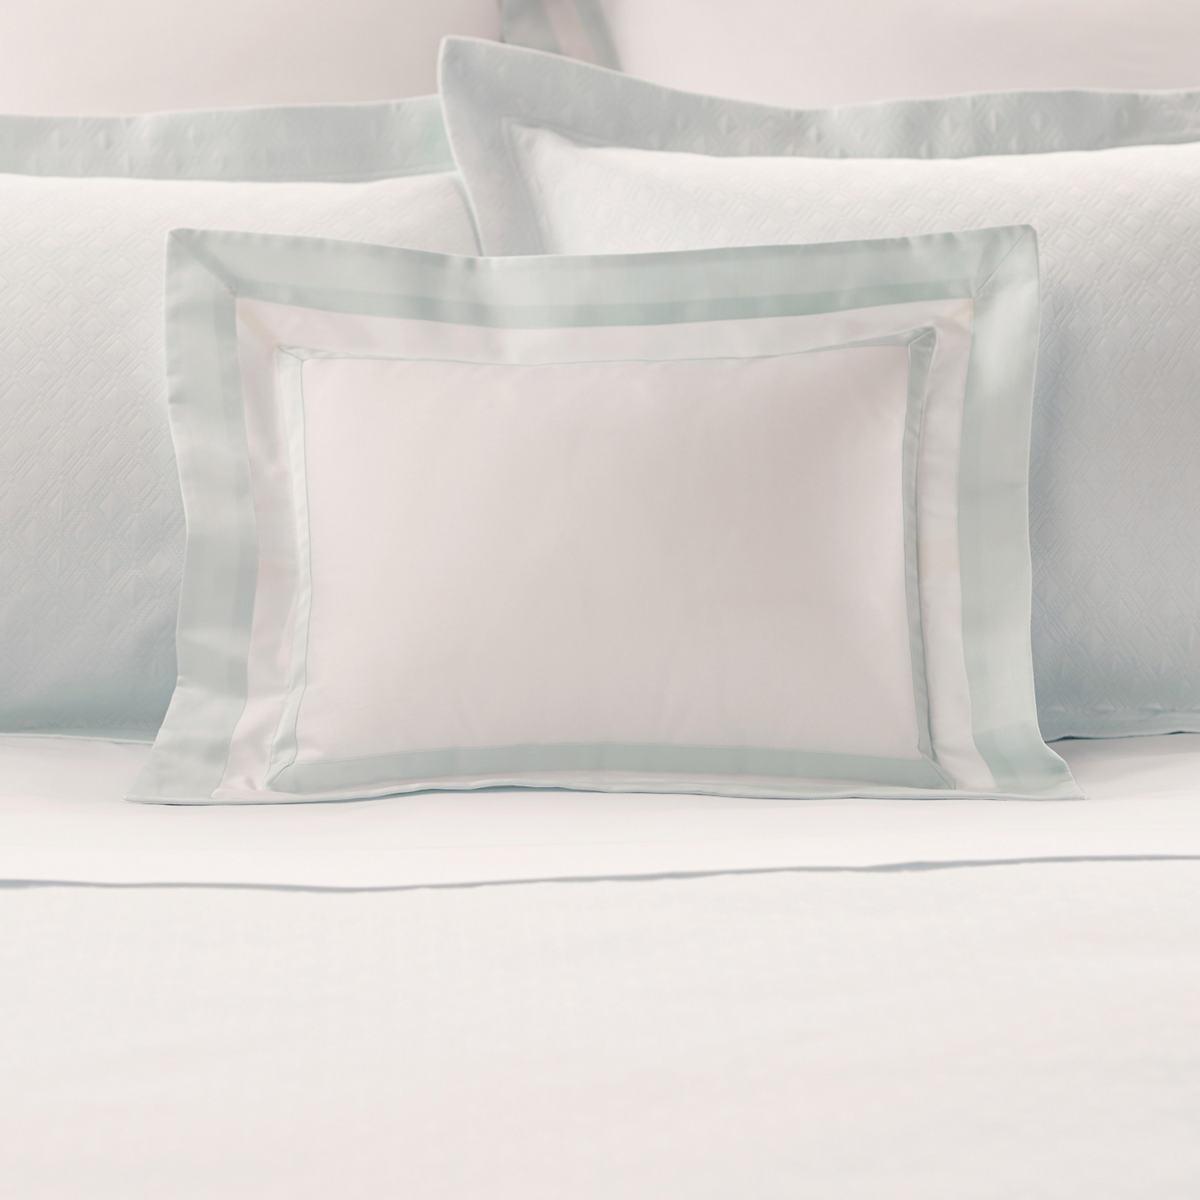 Piazza White/Pearl Blue Decorative Pillow